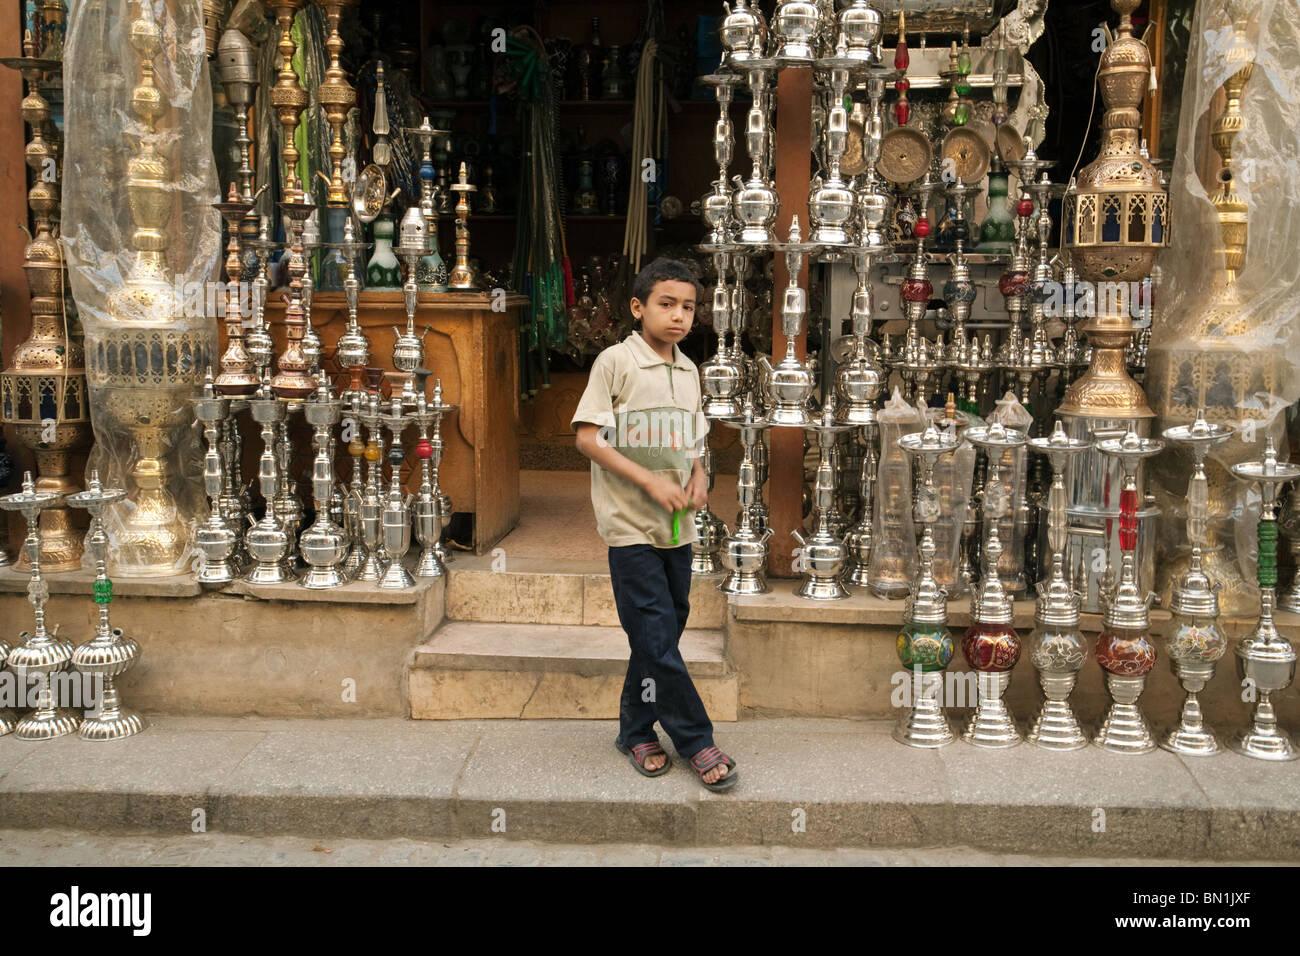 Shop and child shopkeeper in the Khan al khalili market, Islamic quarter, Cairo Egypt - Stock Image